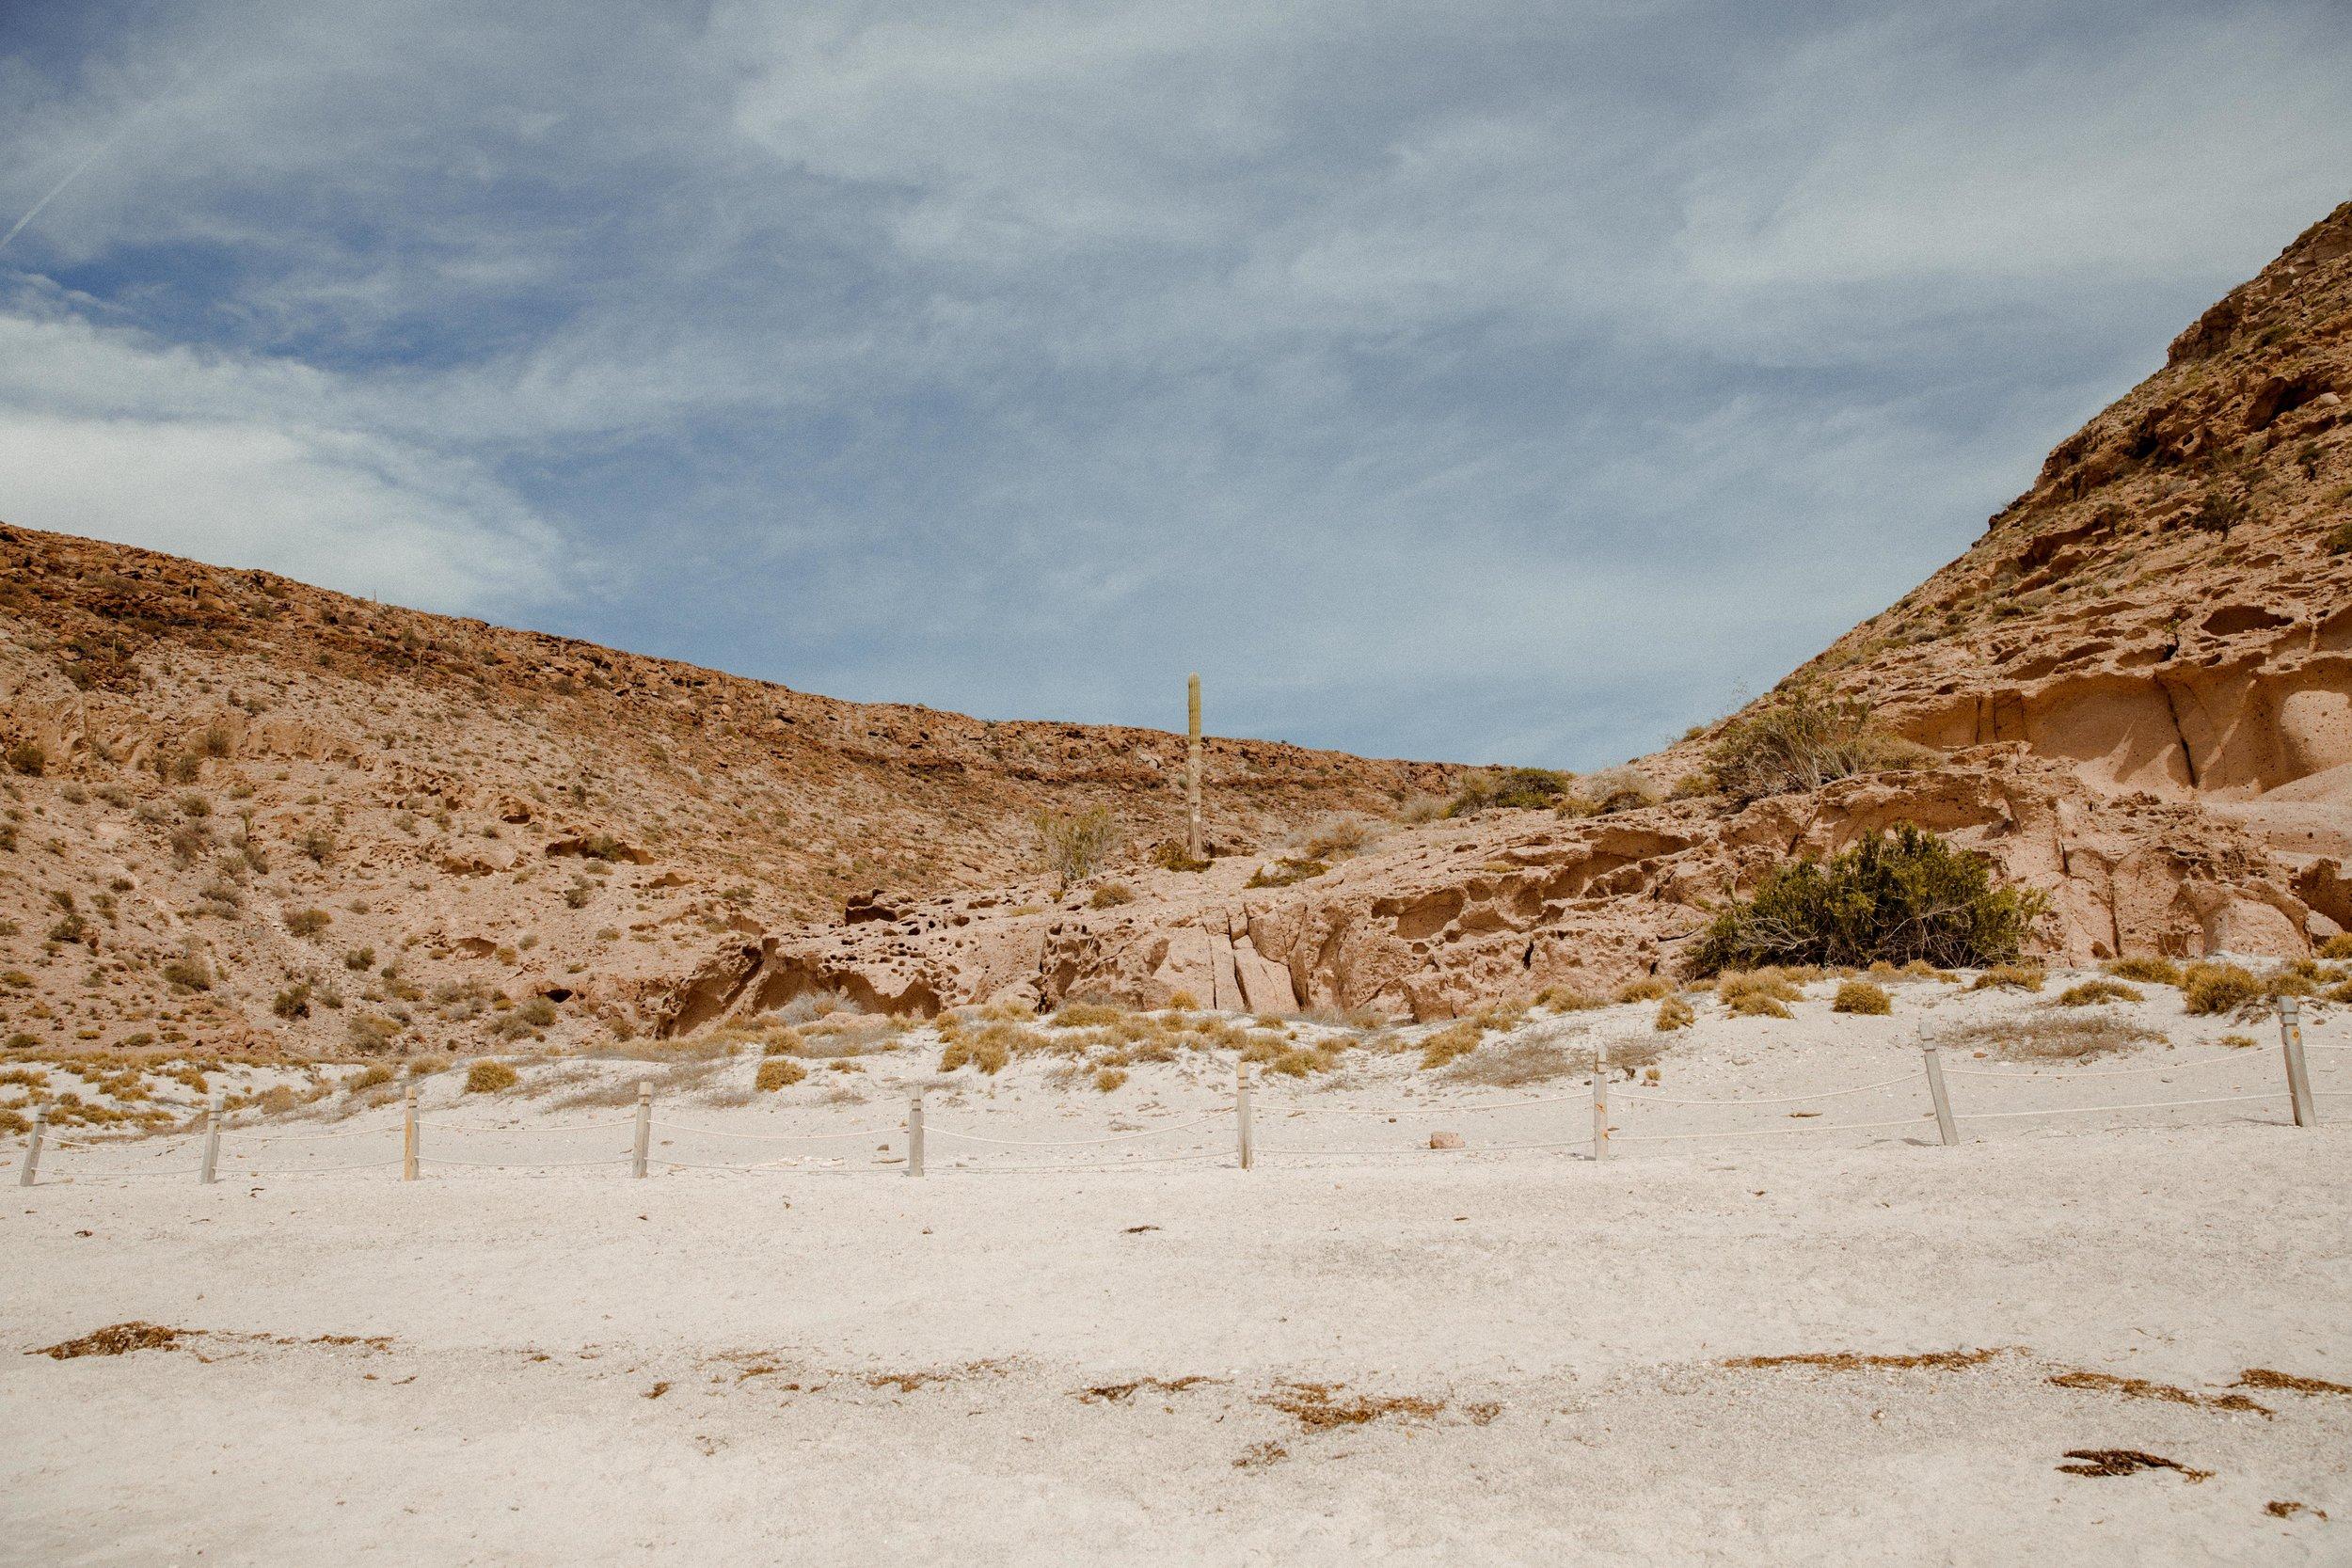 cacti-samlandreth-mexico